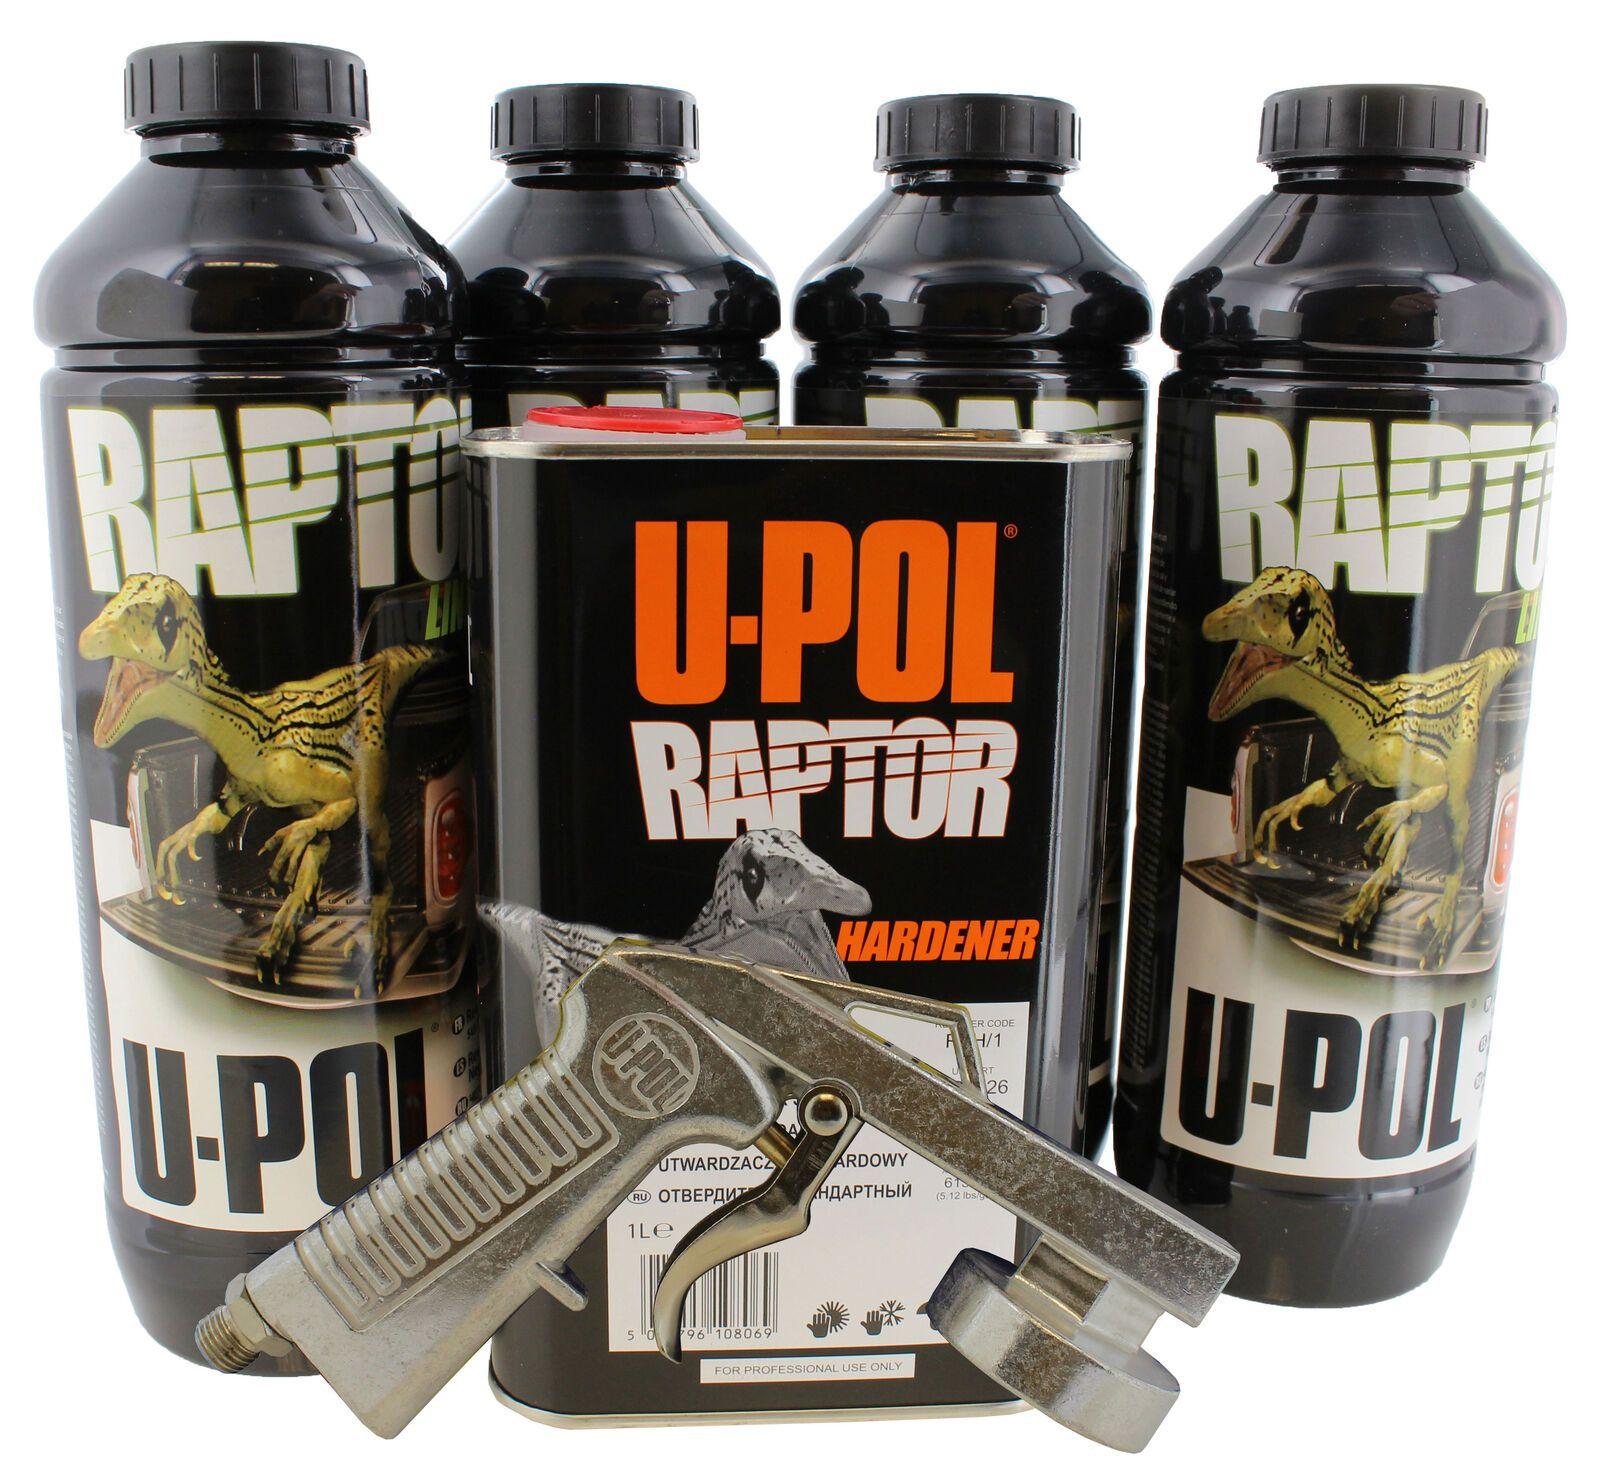 Where to buy Raptor Liner? Raptor liner review in 2020